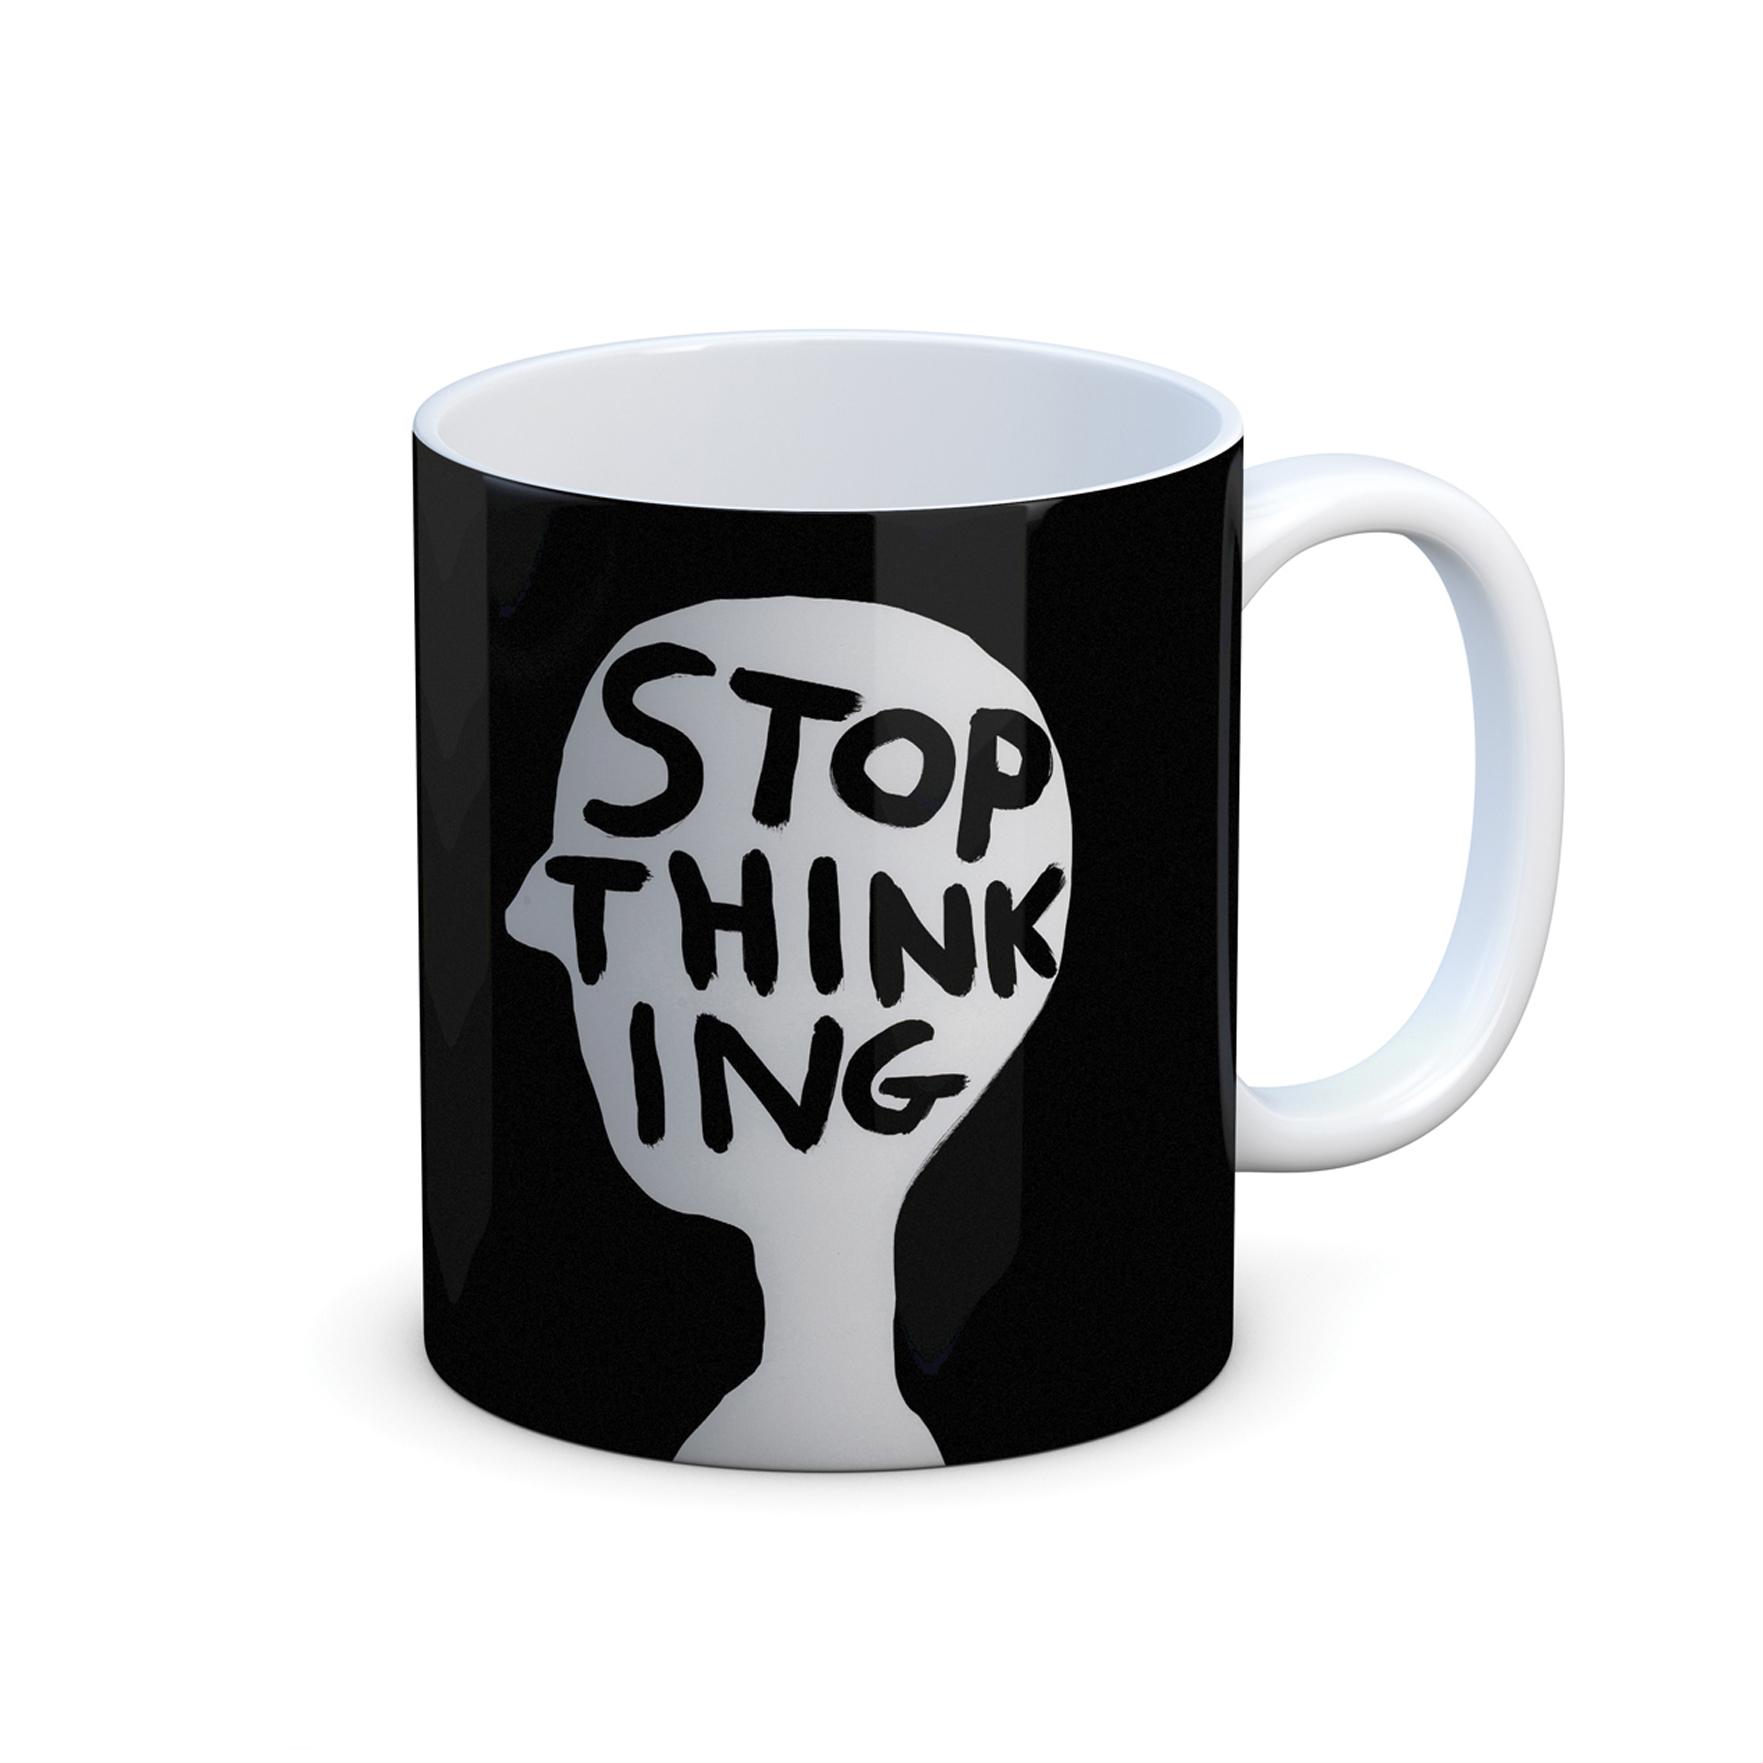 Stop thinking by David Shrigley mug